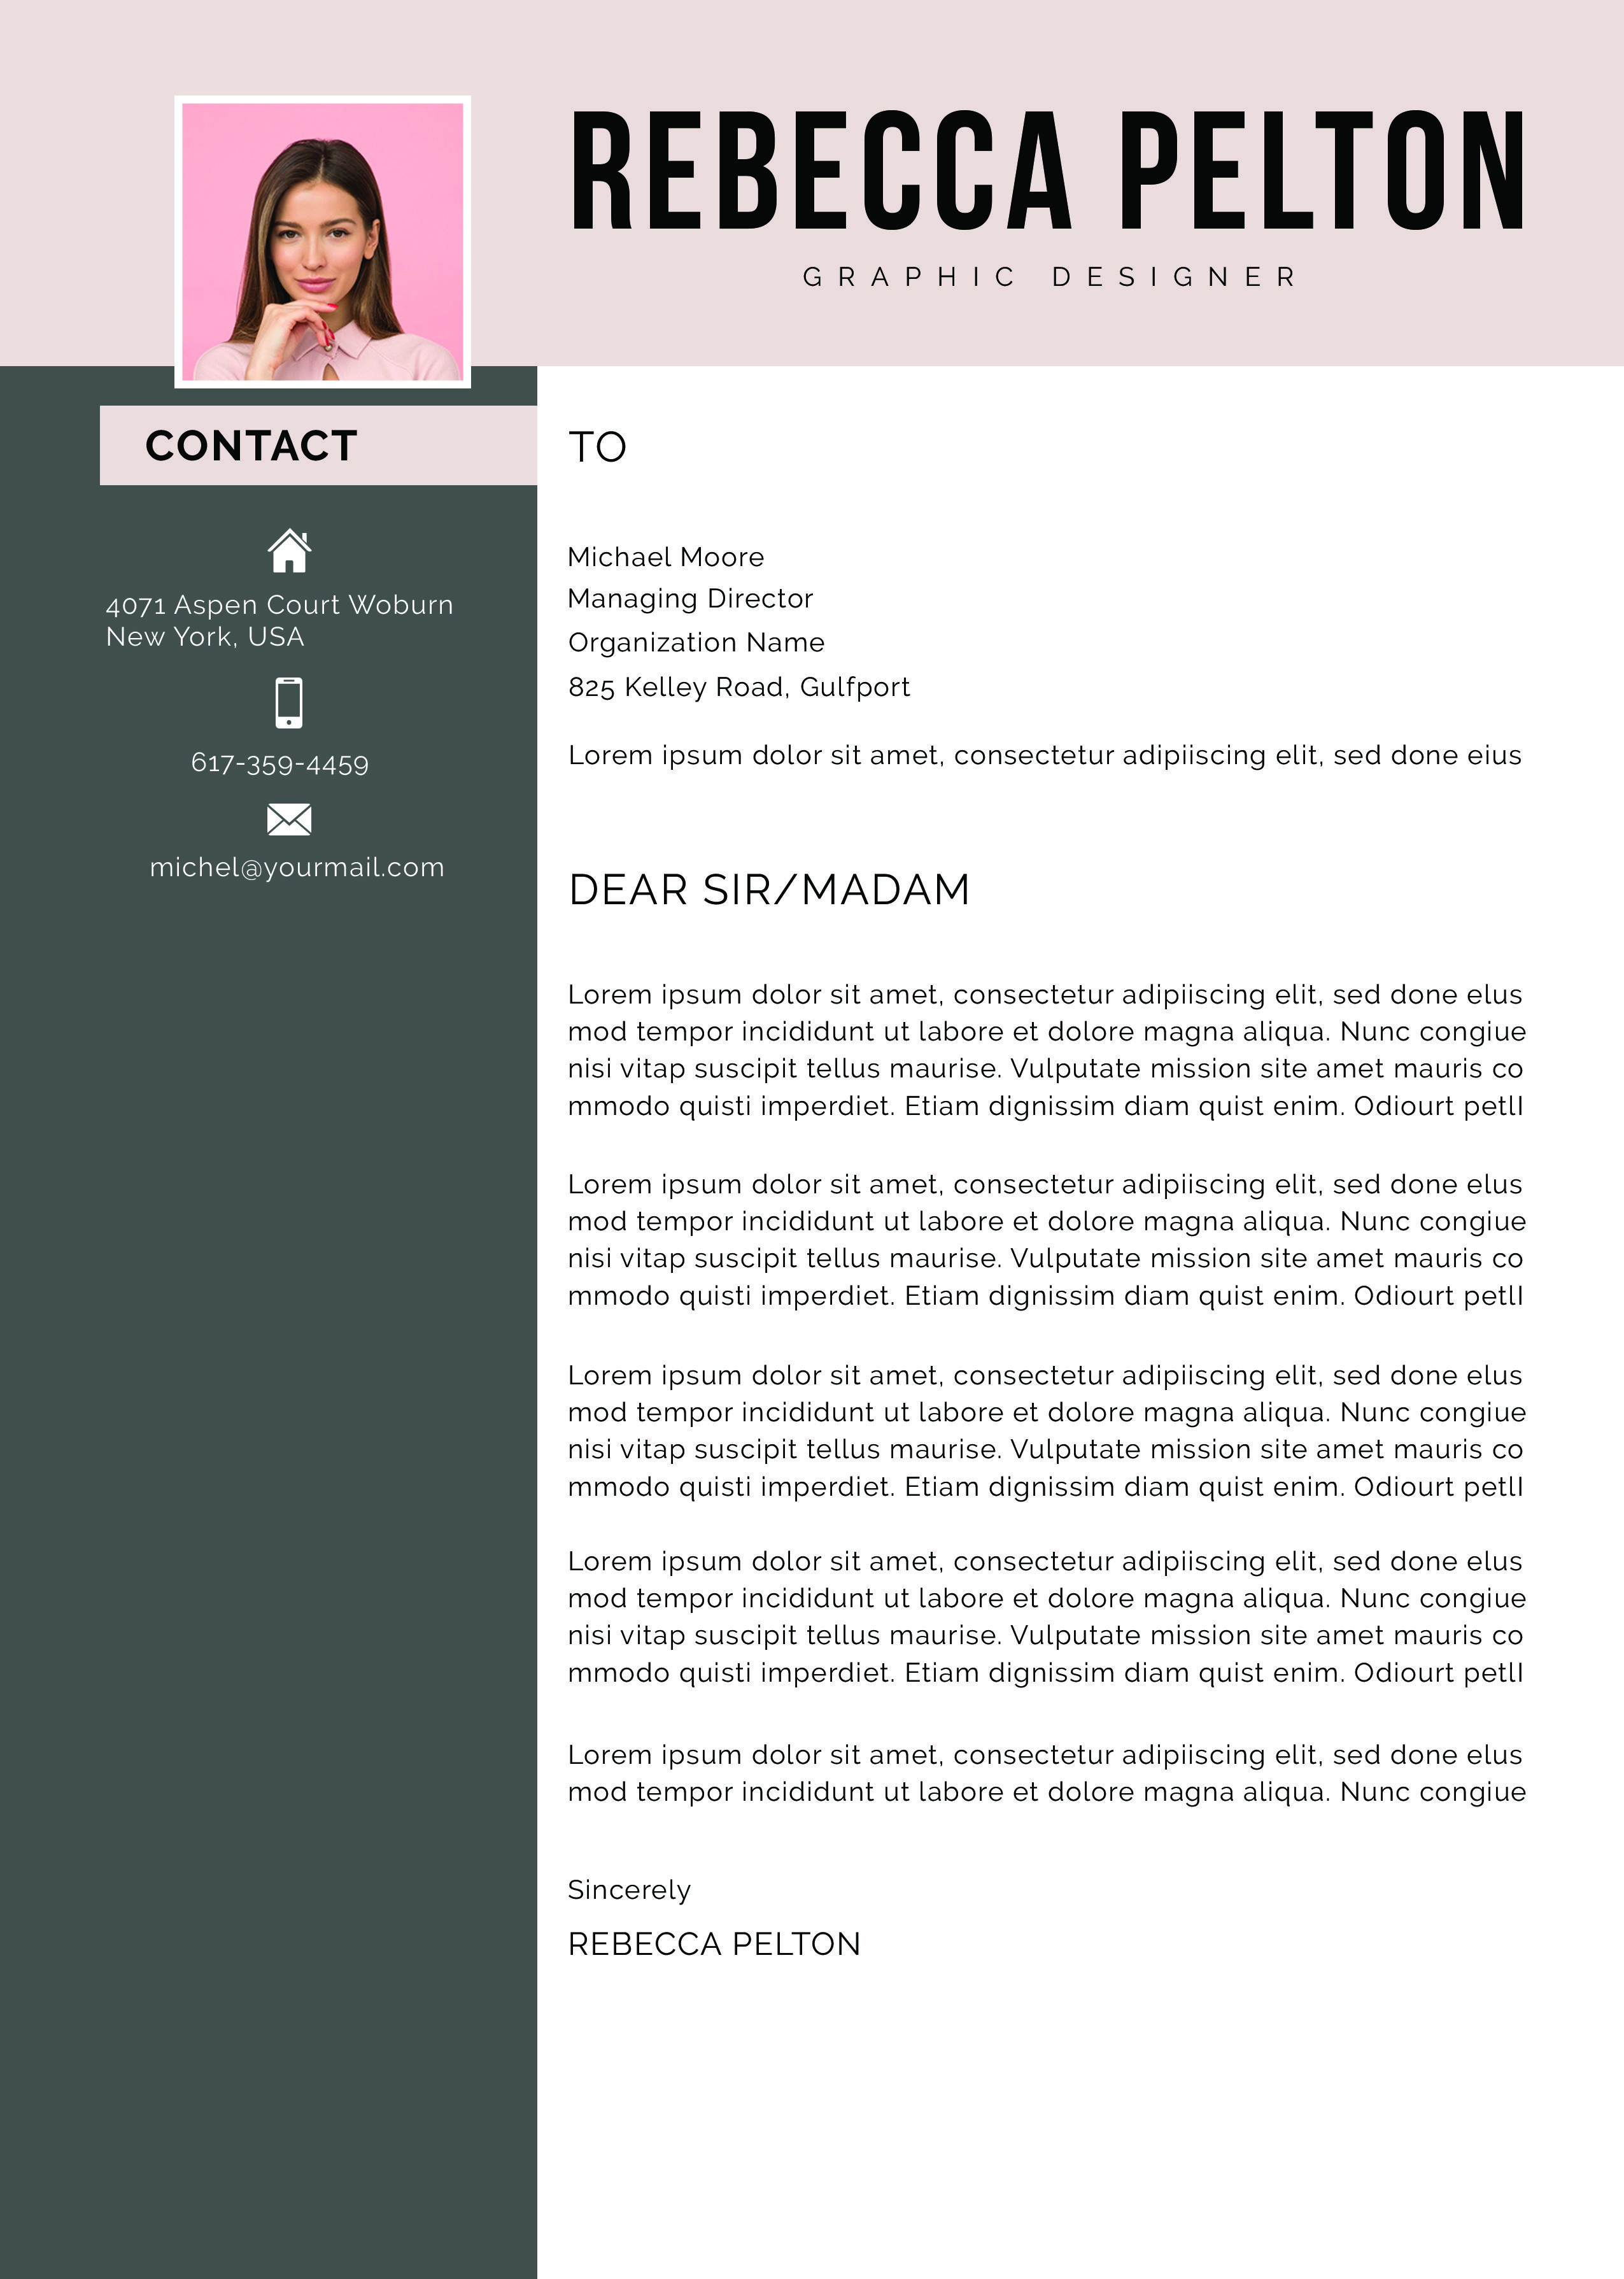 Resume Template Professional Resume Ms Word Resume Modern Resume Resume Design Google Docs Resume Resume Writing Resume Cover Letter Resume Template Word Resume Template Professional Simple Resume Template